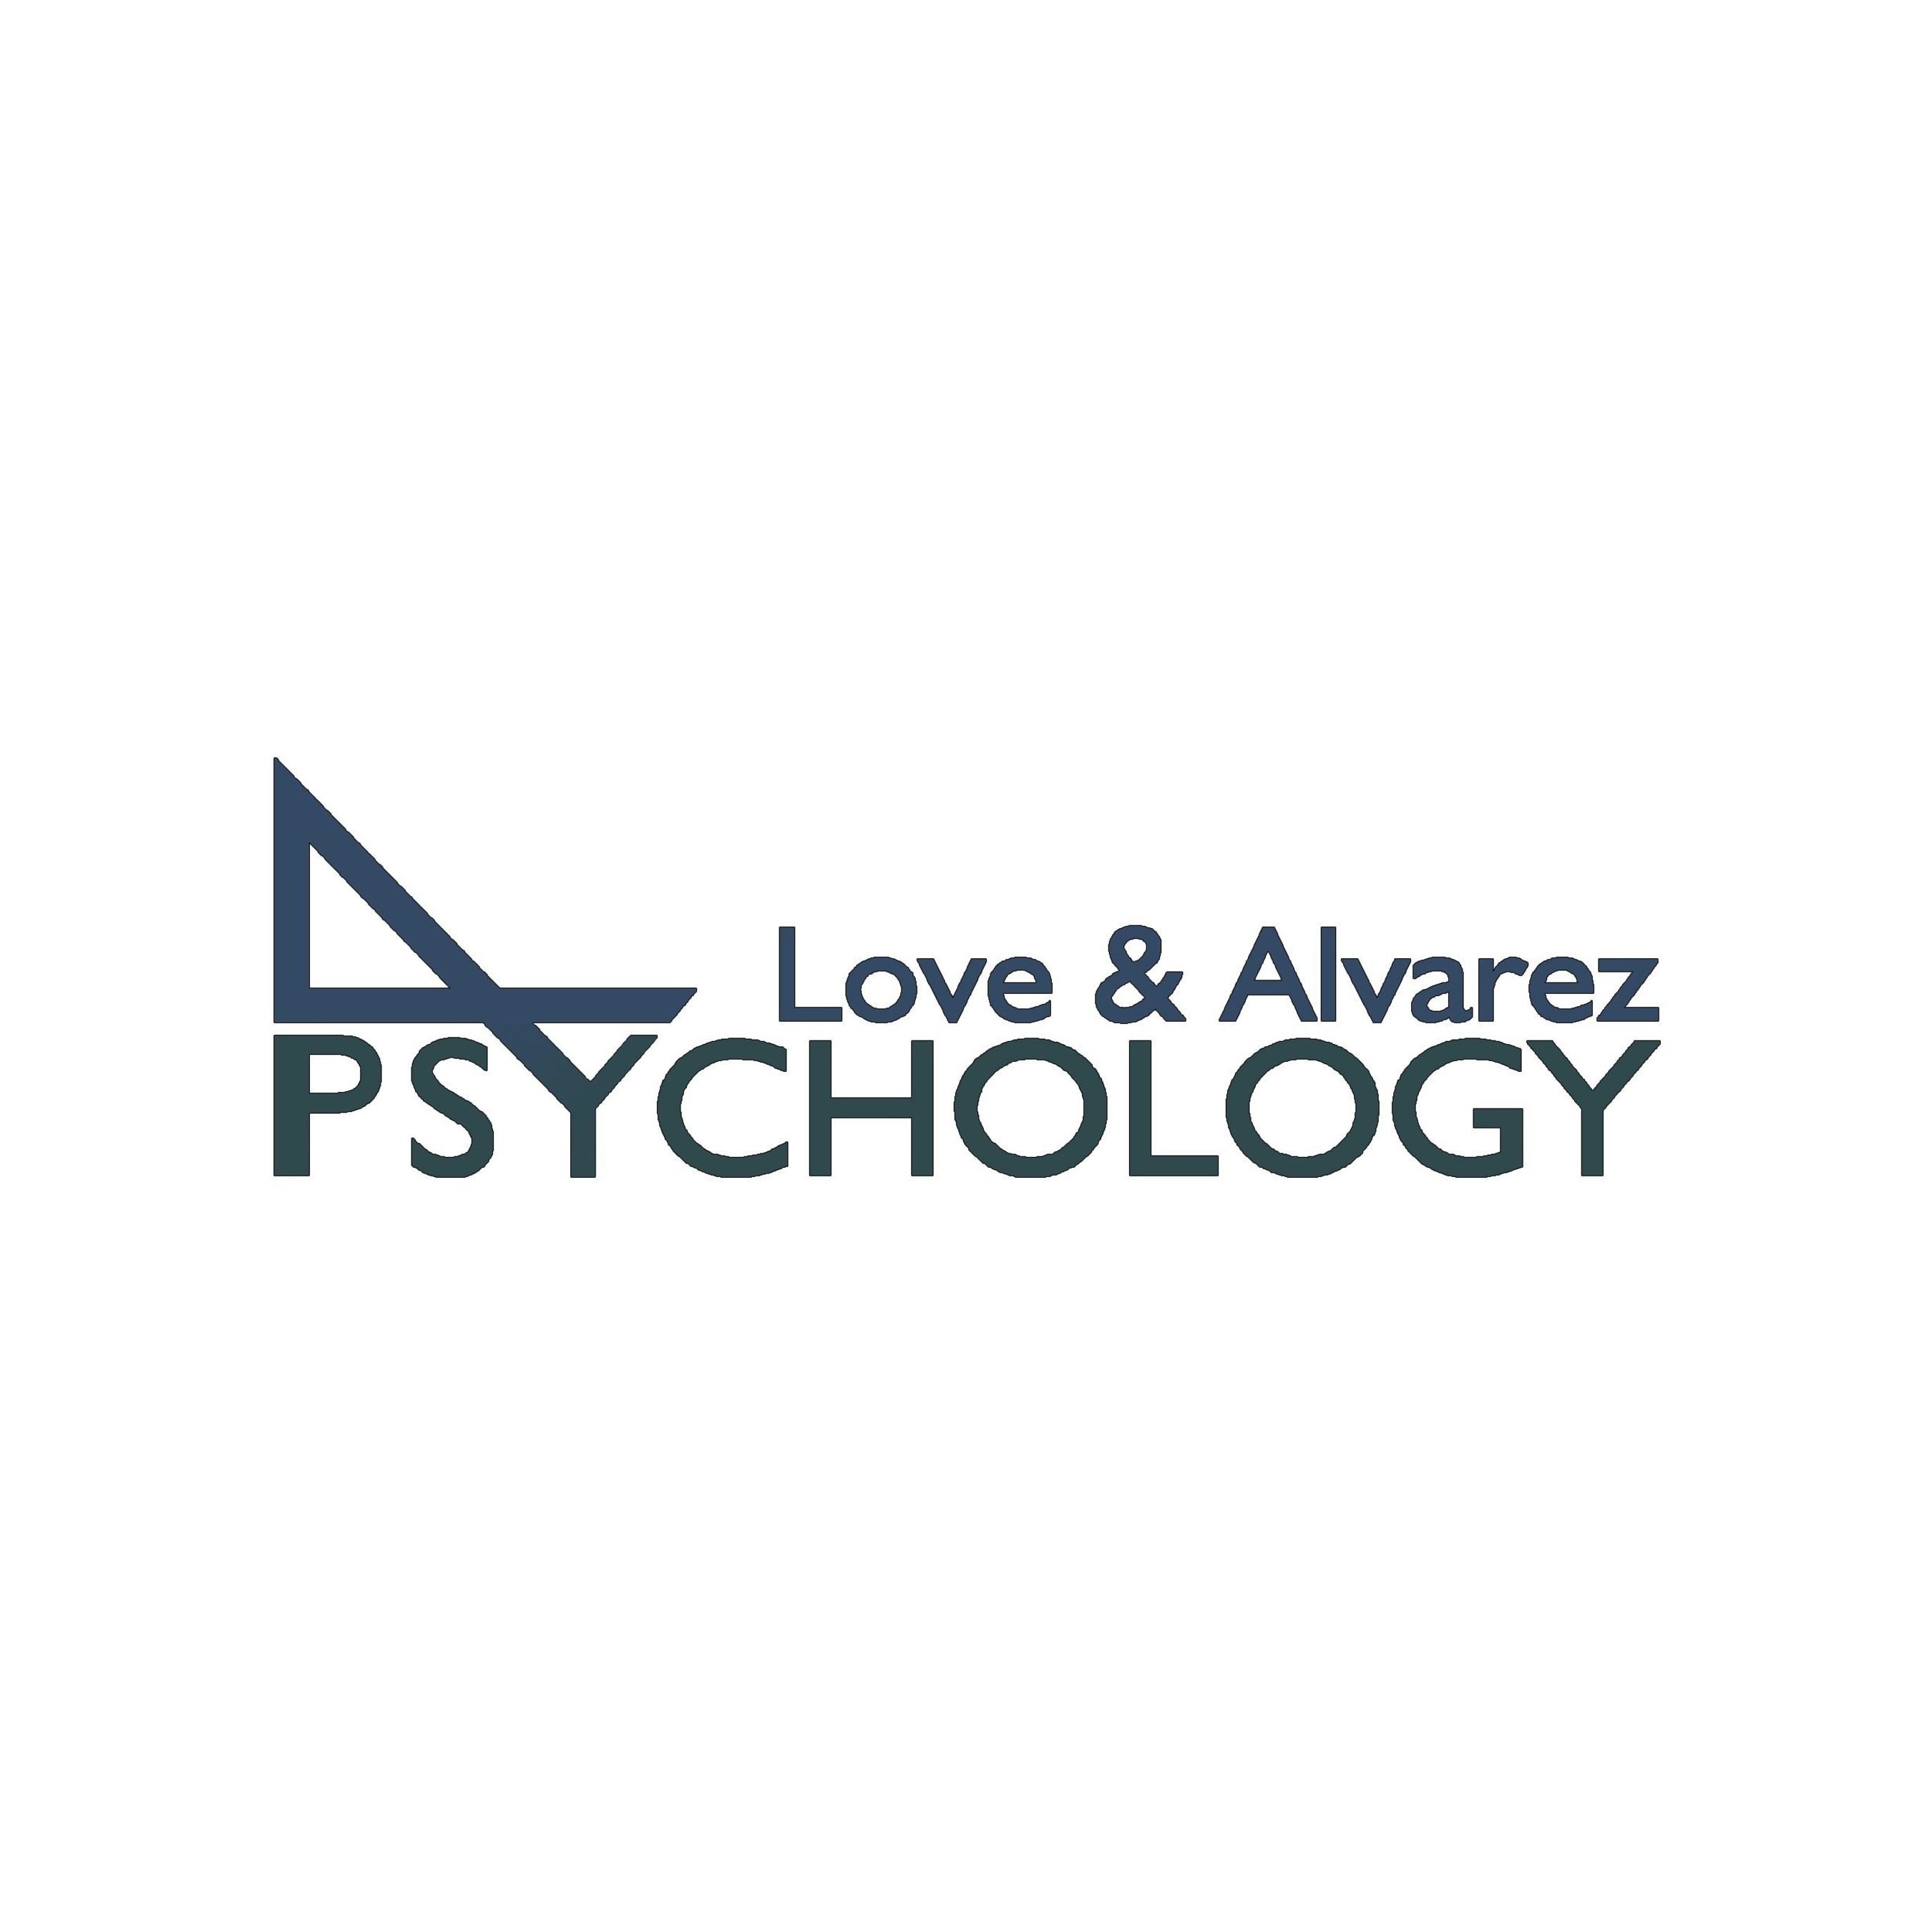 Love & Alvarez Psychology